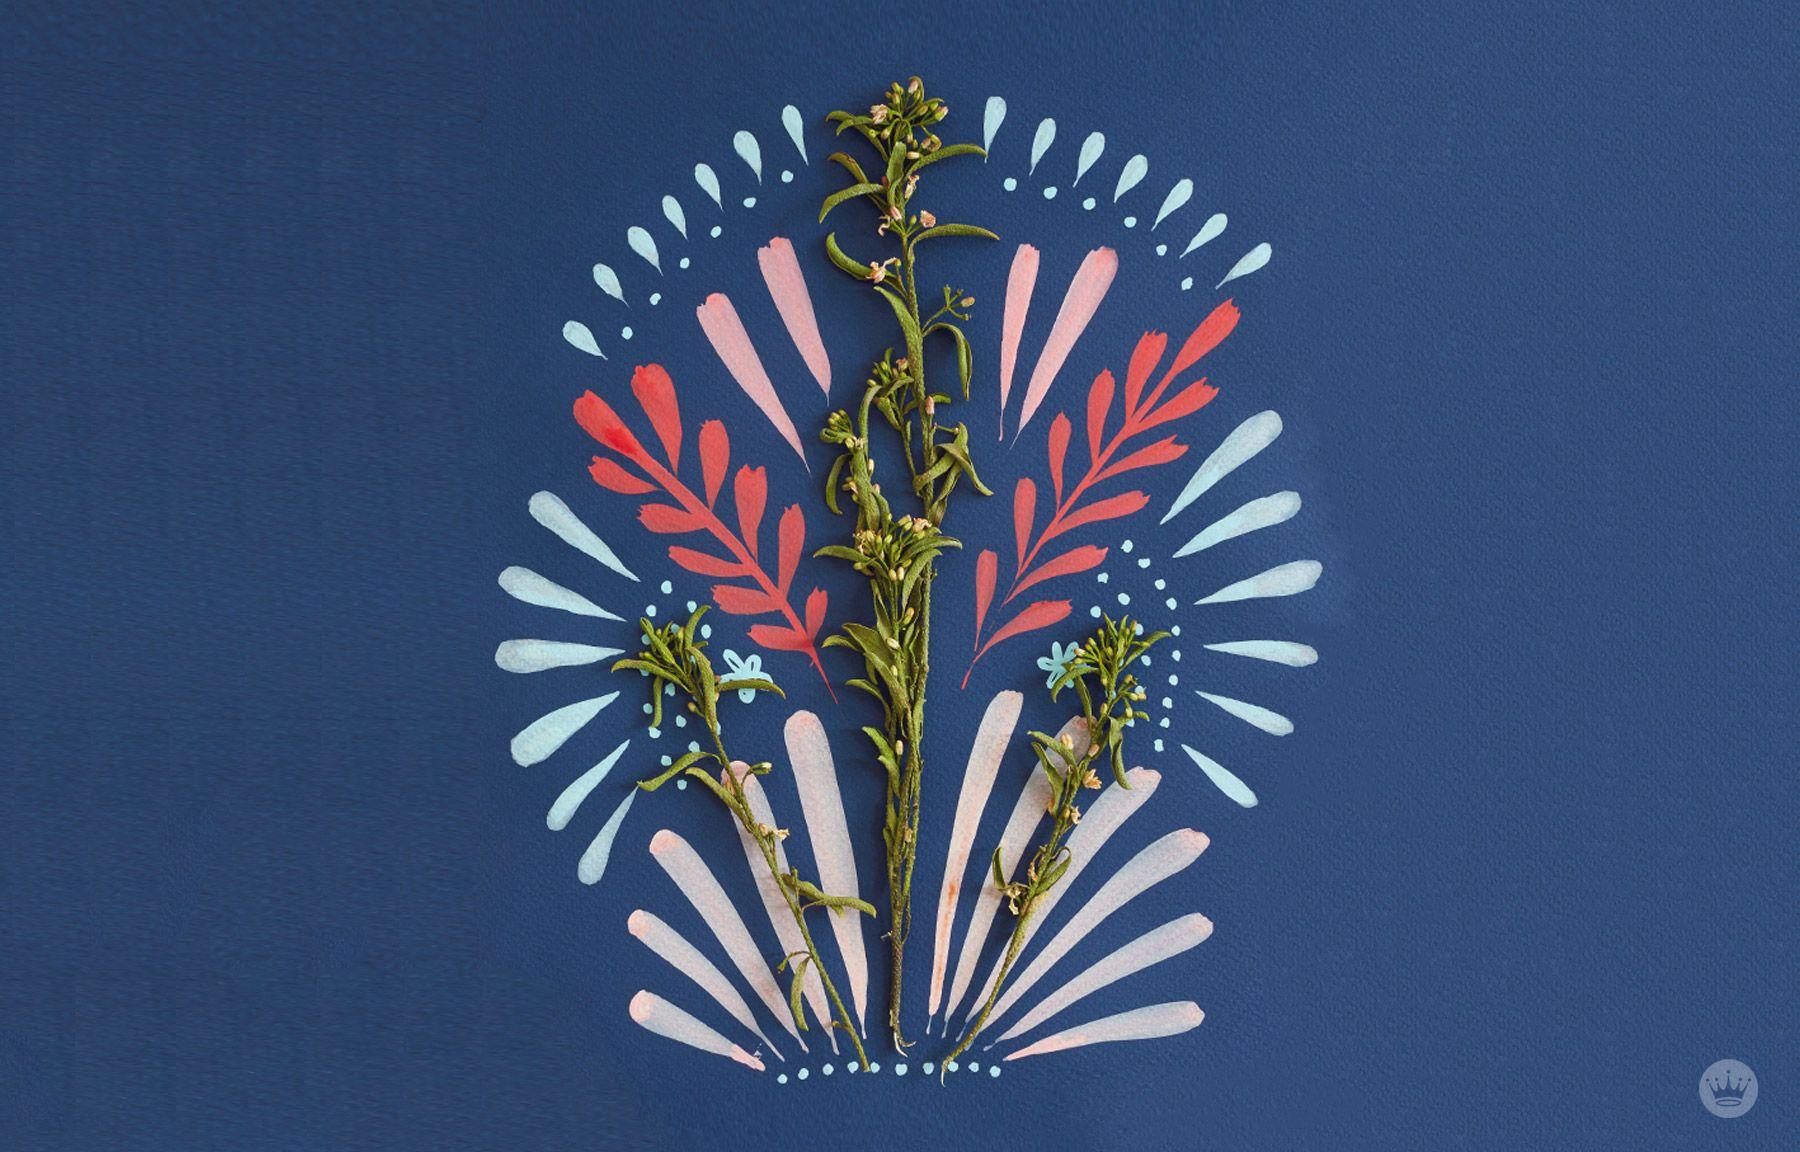 Blue-Floral-Wallpaper-_-thinkmakeshareblog.jpg 1,800×1,152